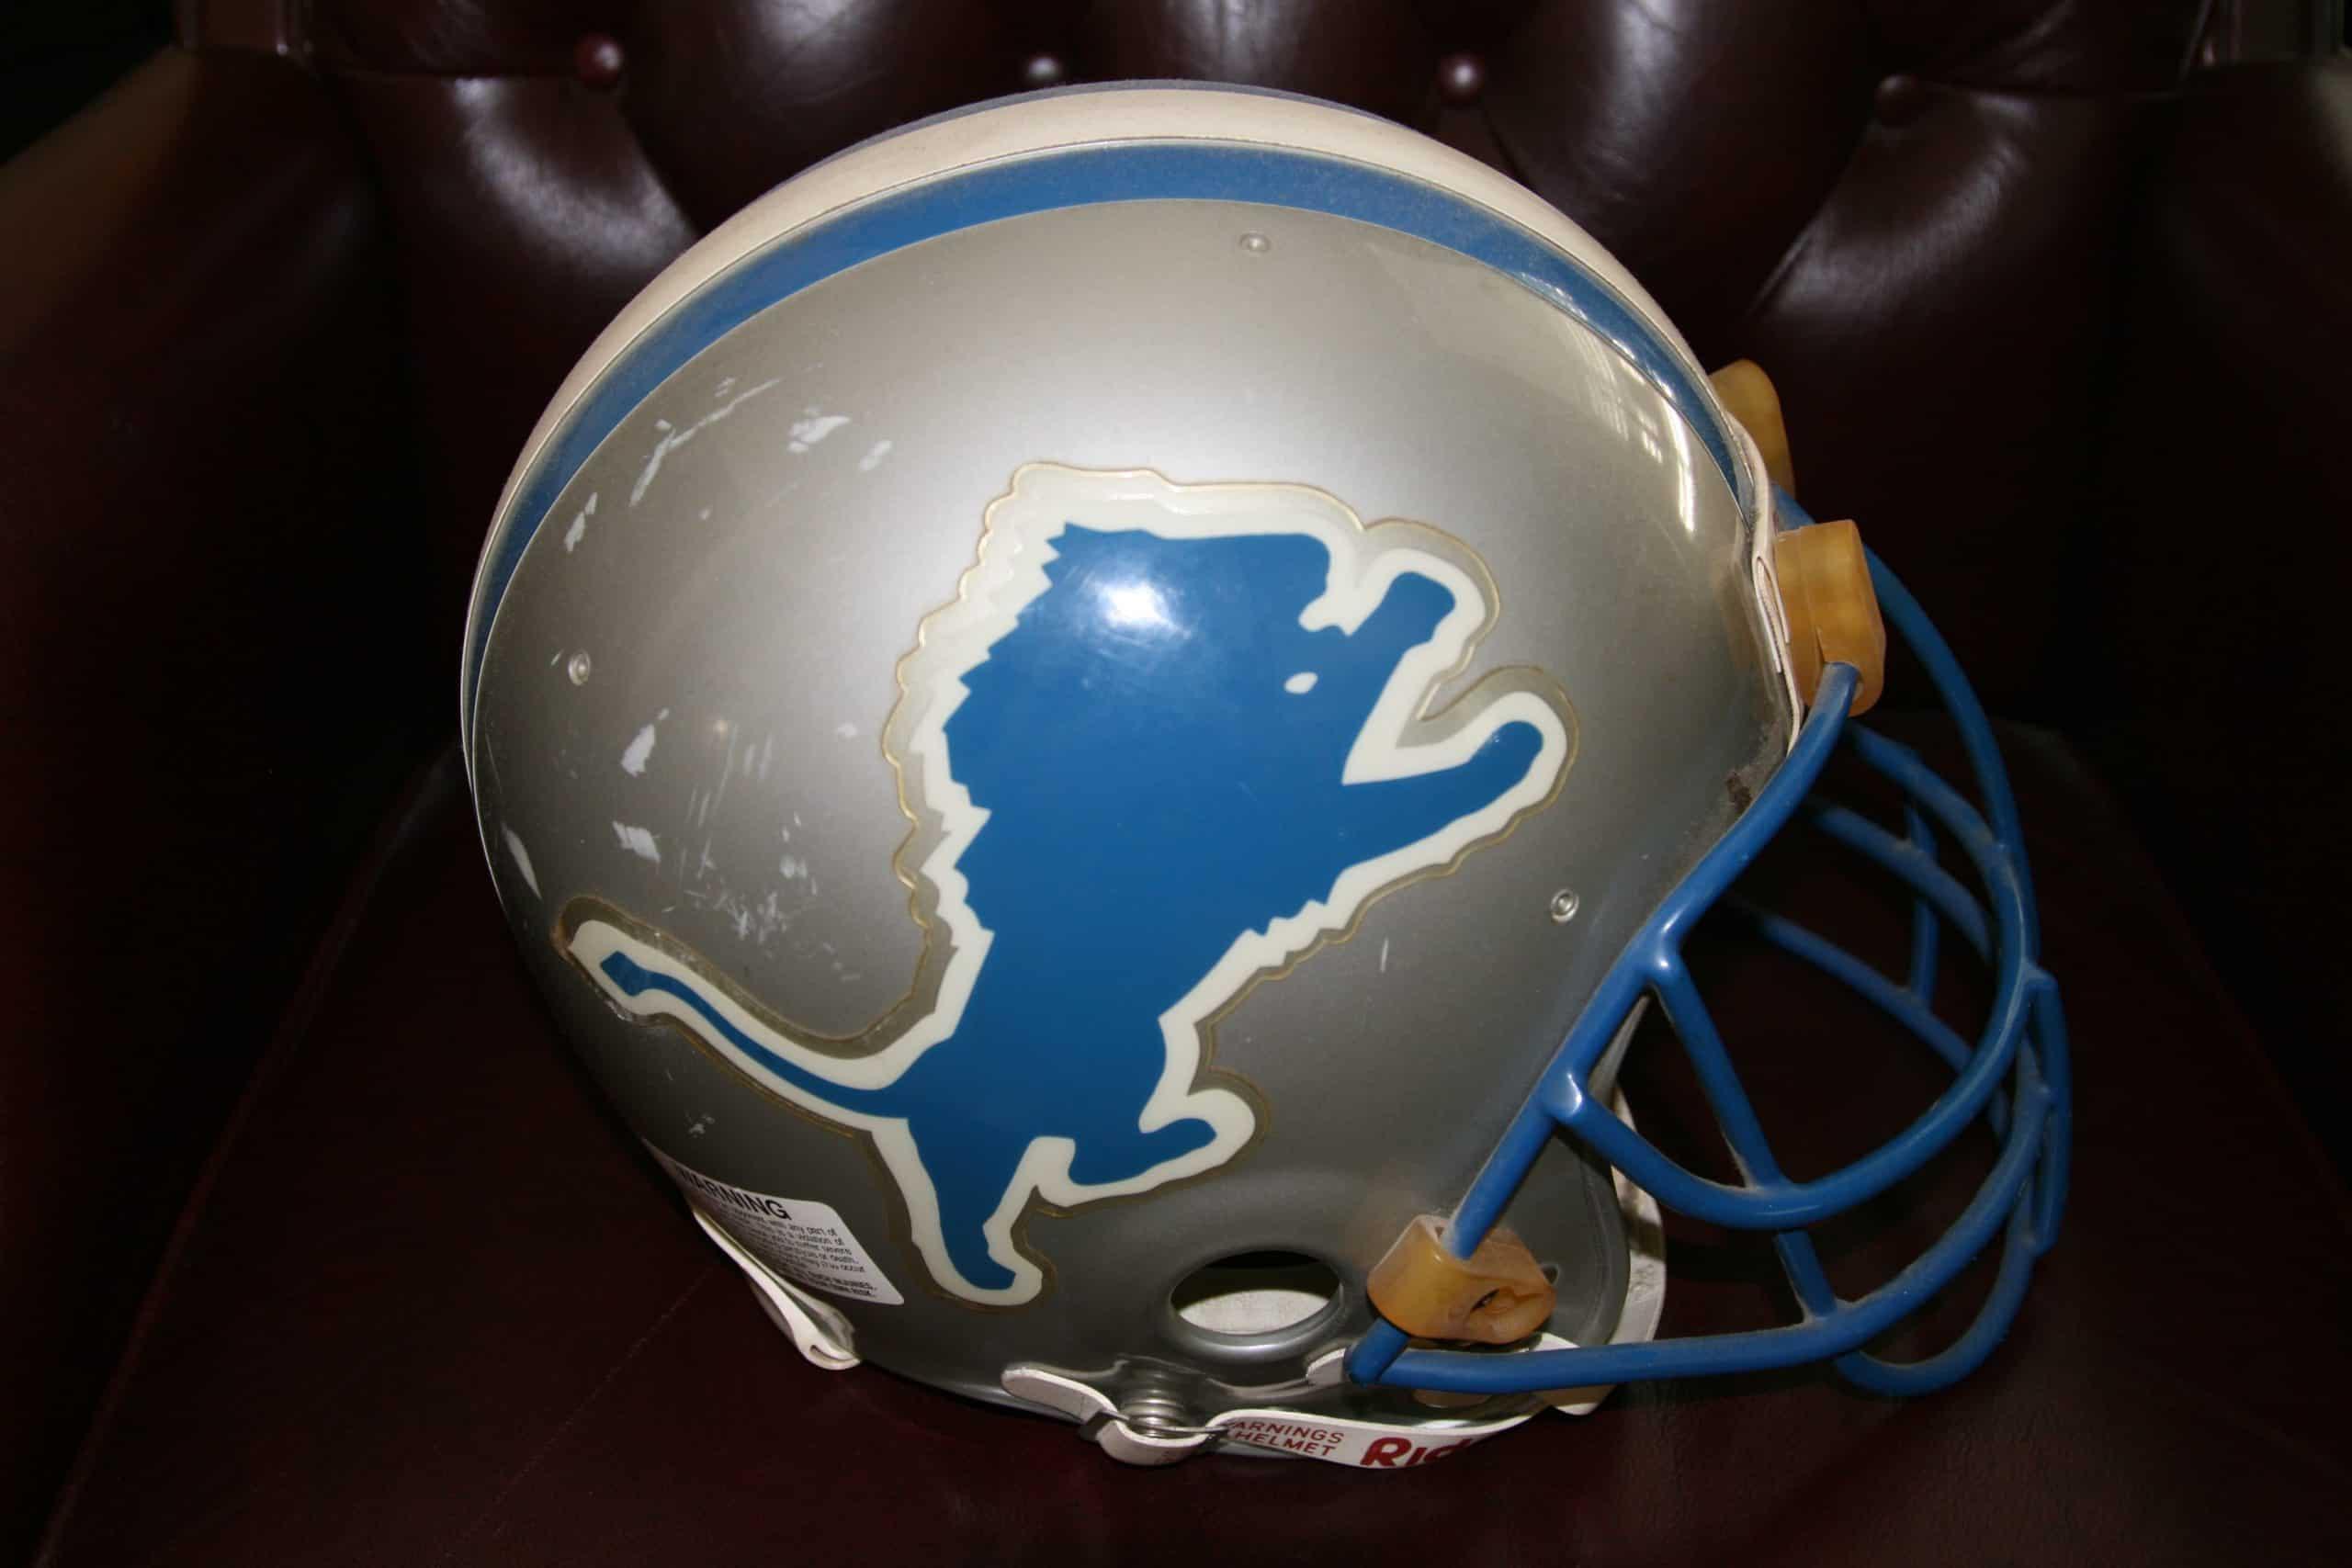 Detroit Lions Helmet Amp Logo 6 X 12 Repositionable Decals